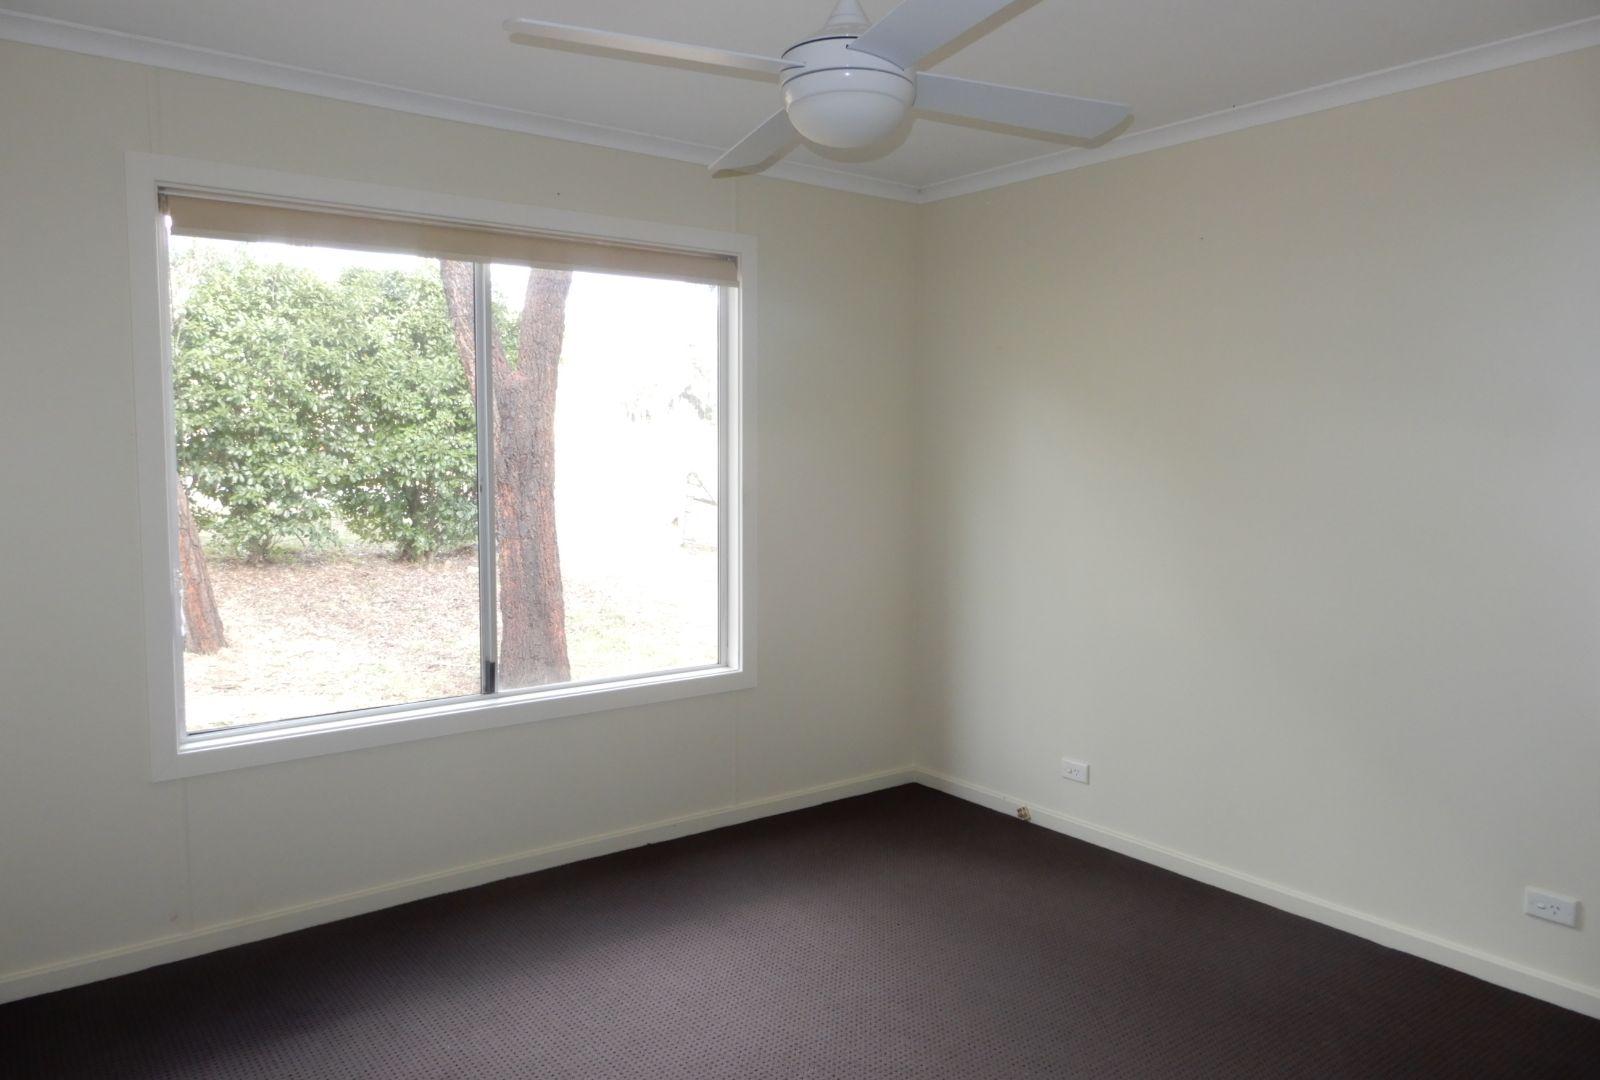 76 O'Connell Street, Murrurundi NSW 2338, Image 2